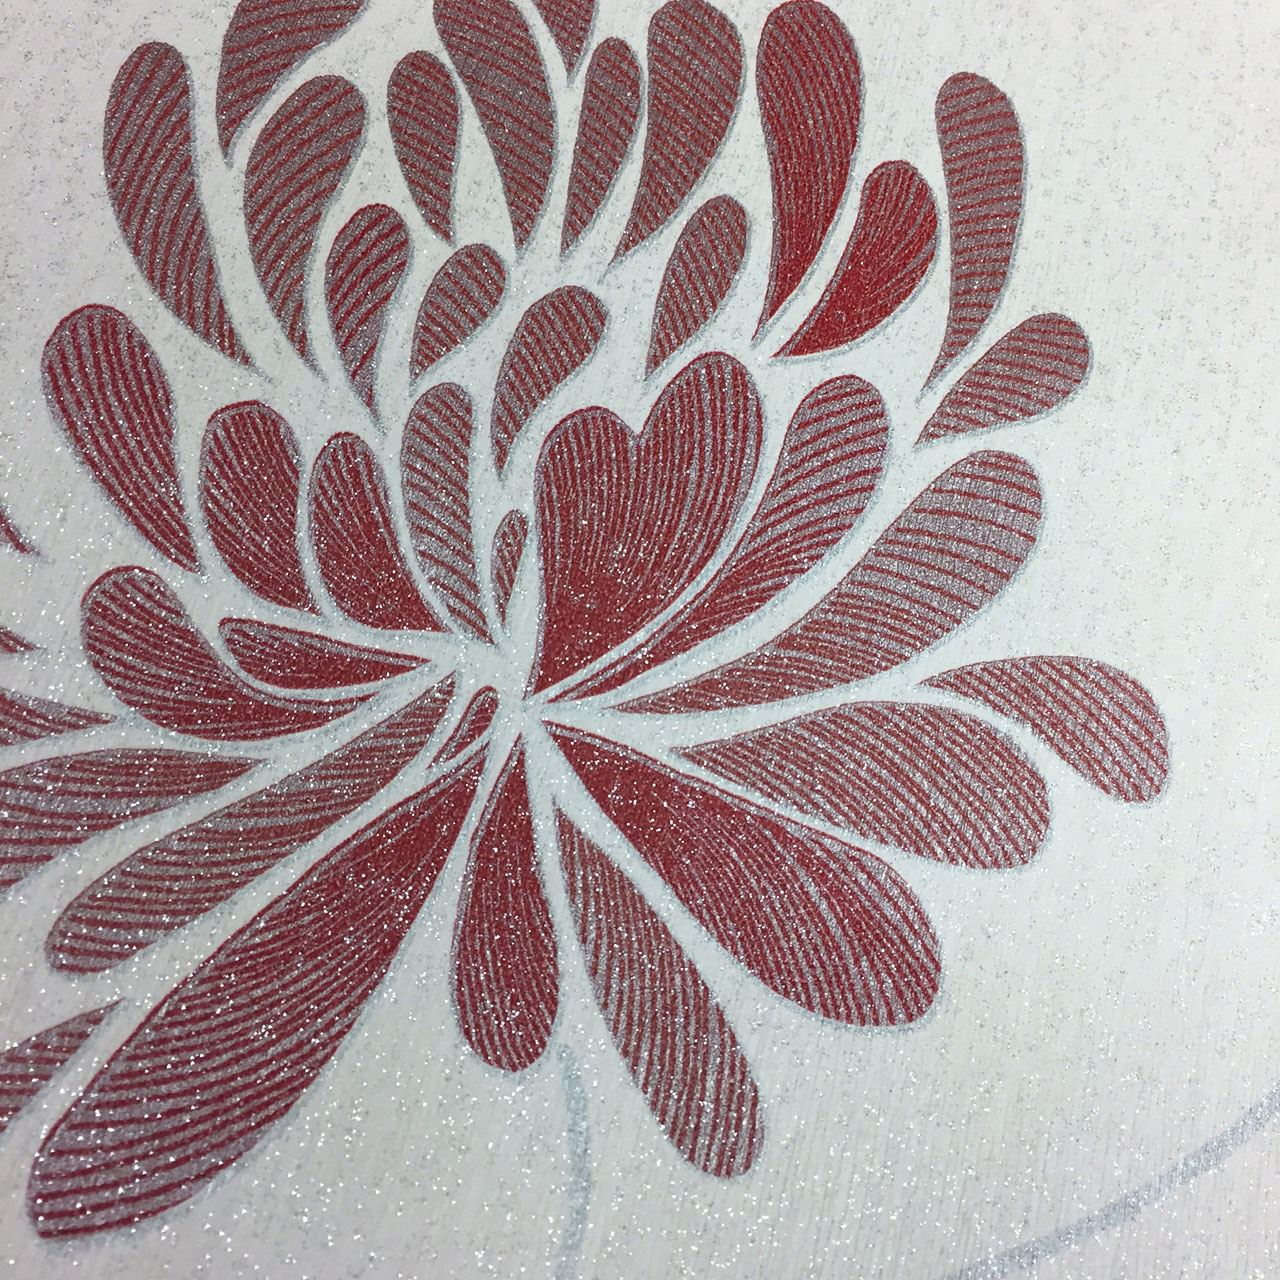 Flower Floral Metallic Glitter Wallpaper Luxury Textured